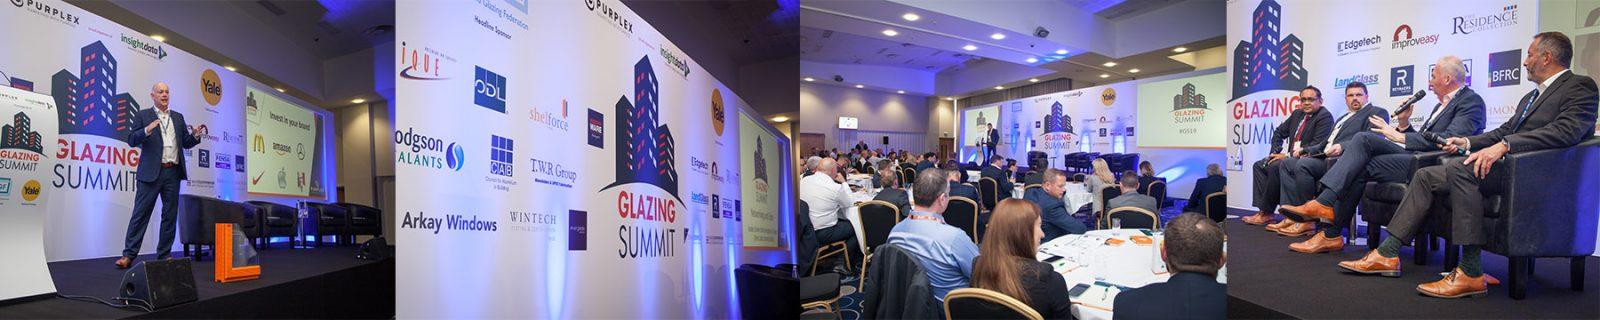 The Glazing Summit 2019